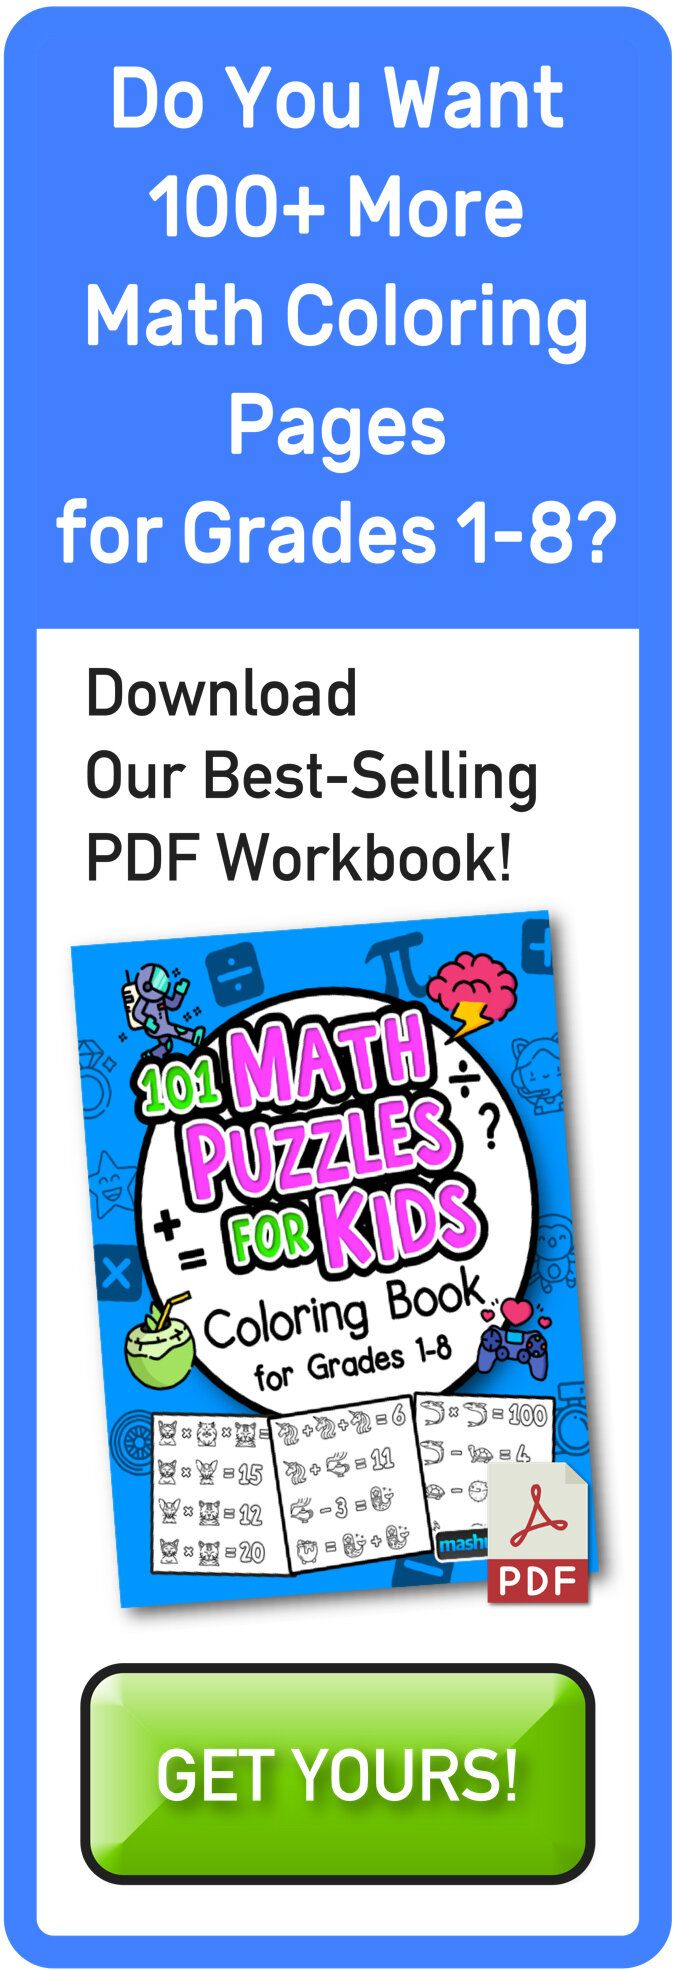 Free Math Puzzles Mashup Math Maths Puzzles Free Math Math Riddles With Answers [ 1970 x 677 Pixel ]